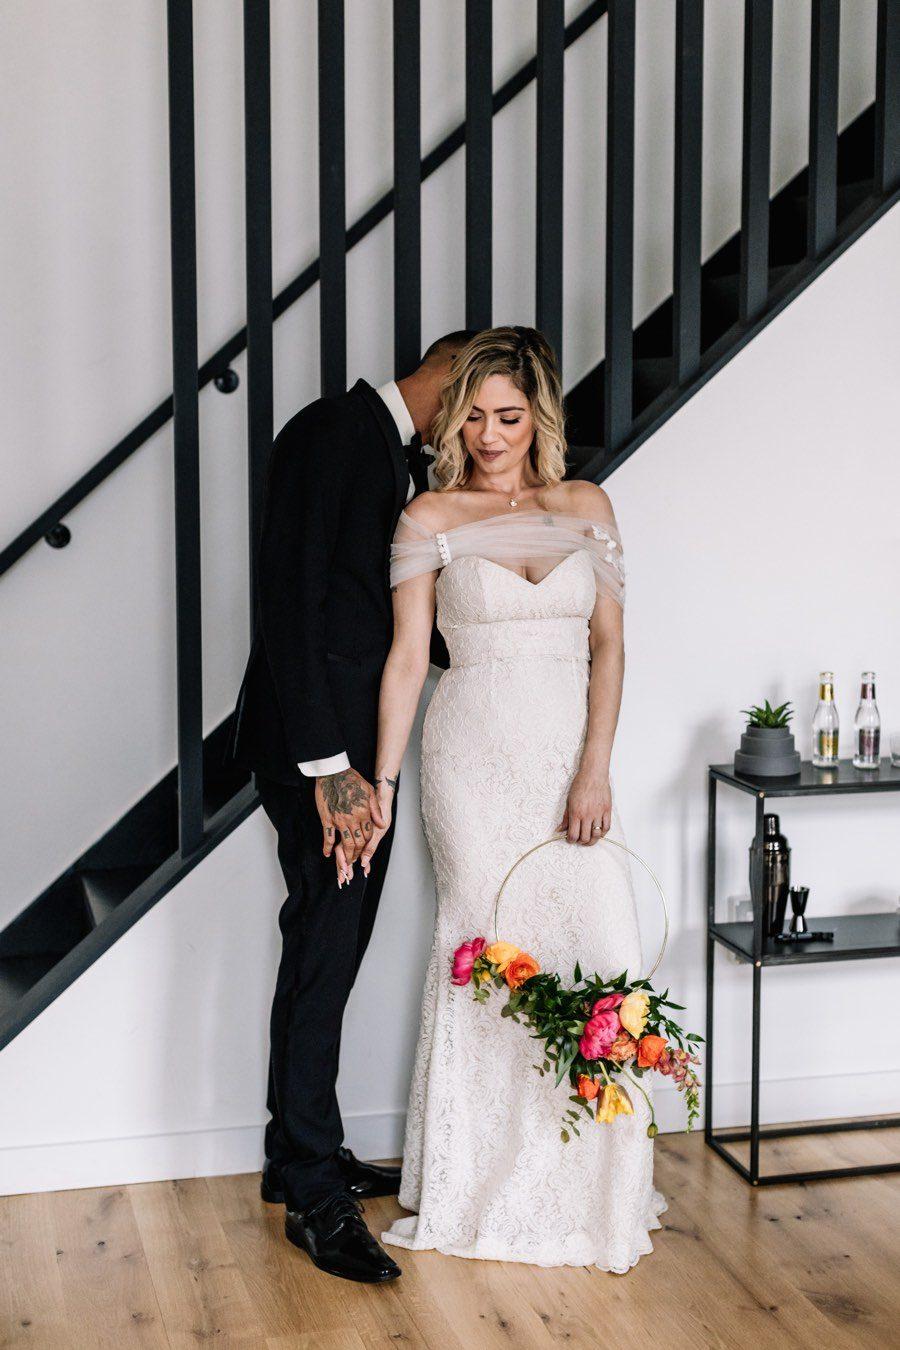 Lokal Fishtown Hotel bride and groom